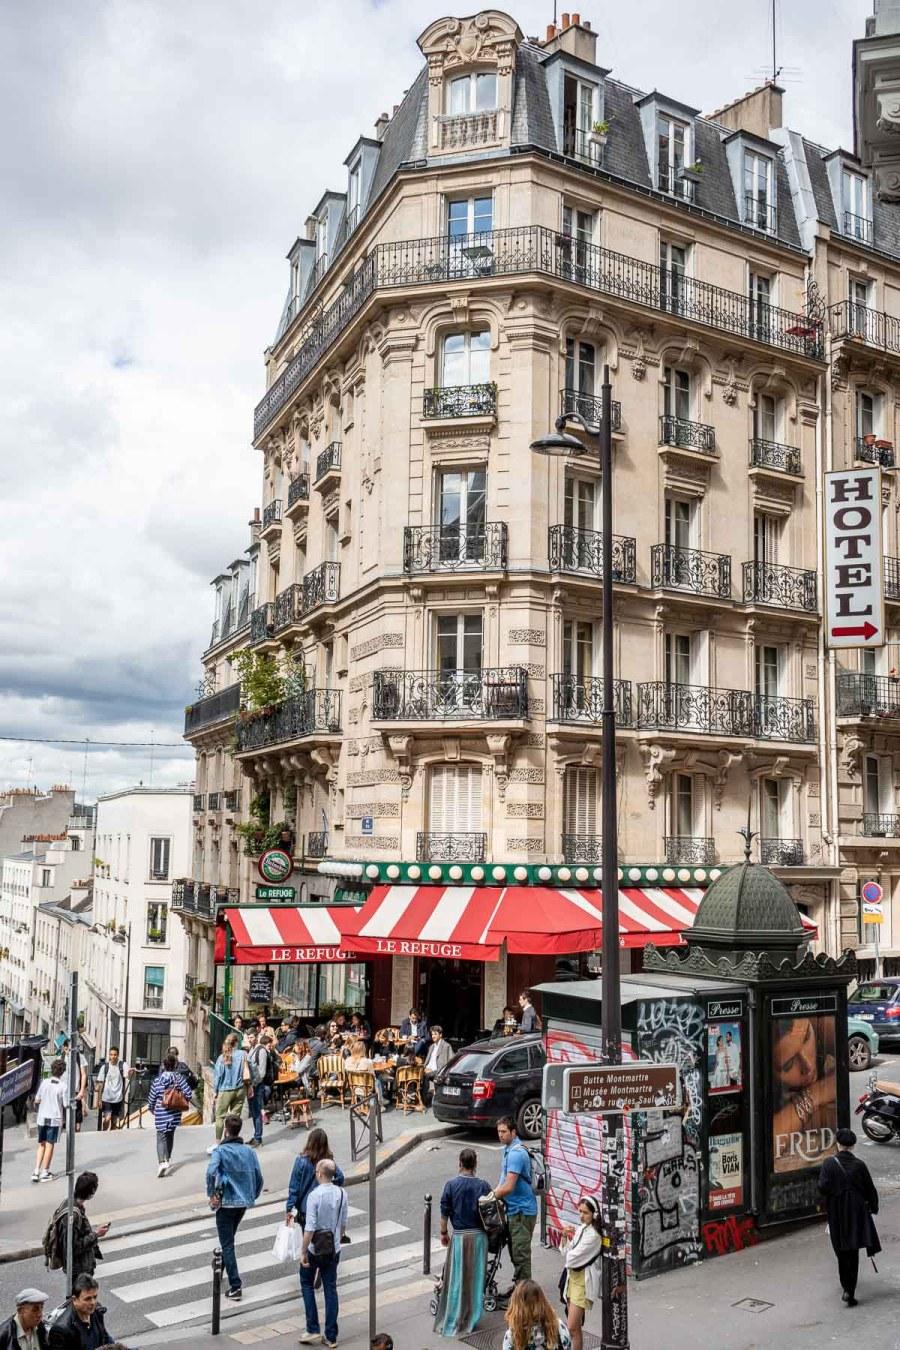 Lamarck-Caulaincourt in Paris